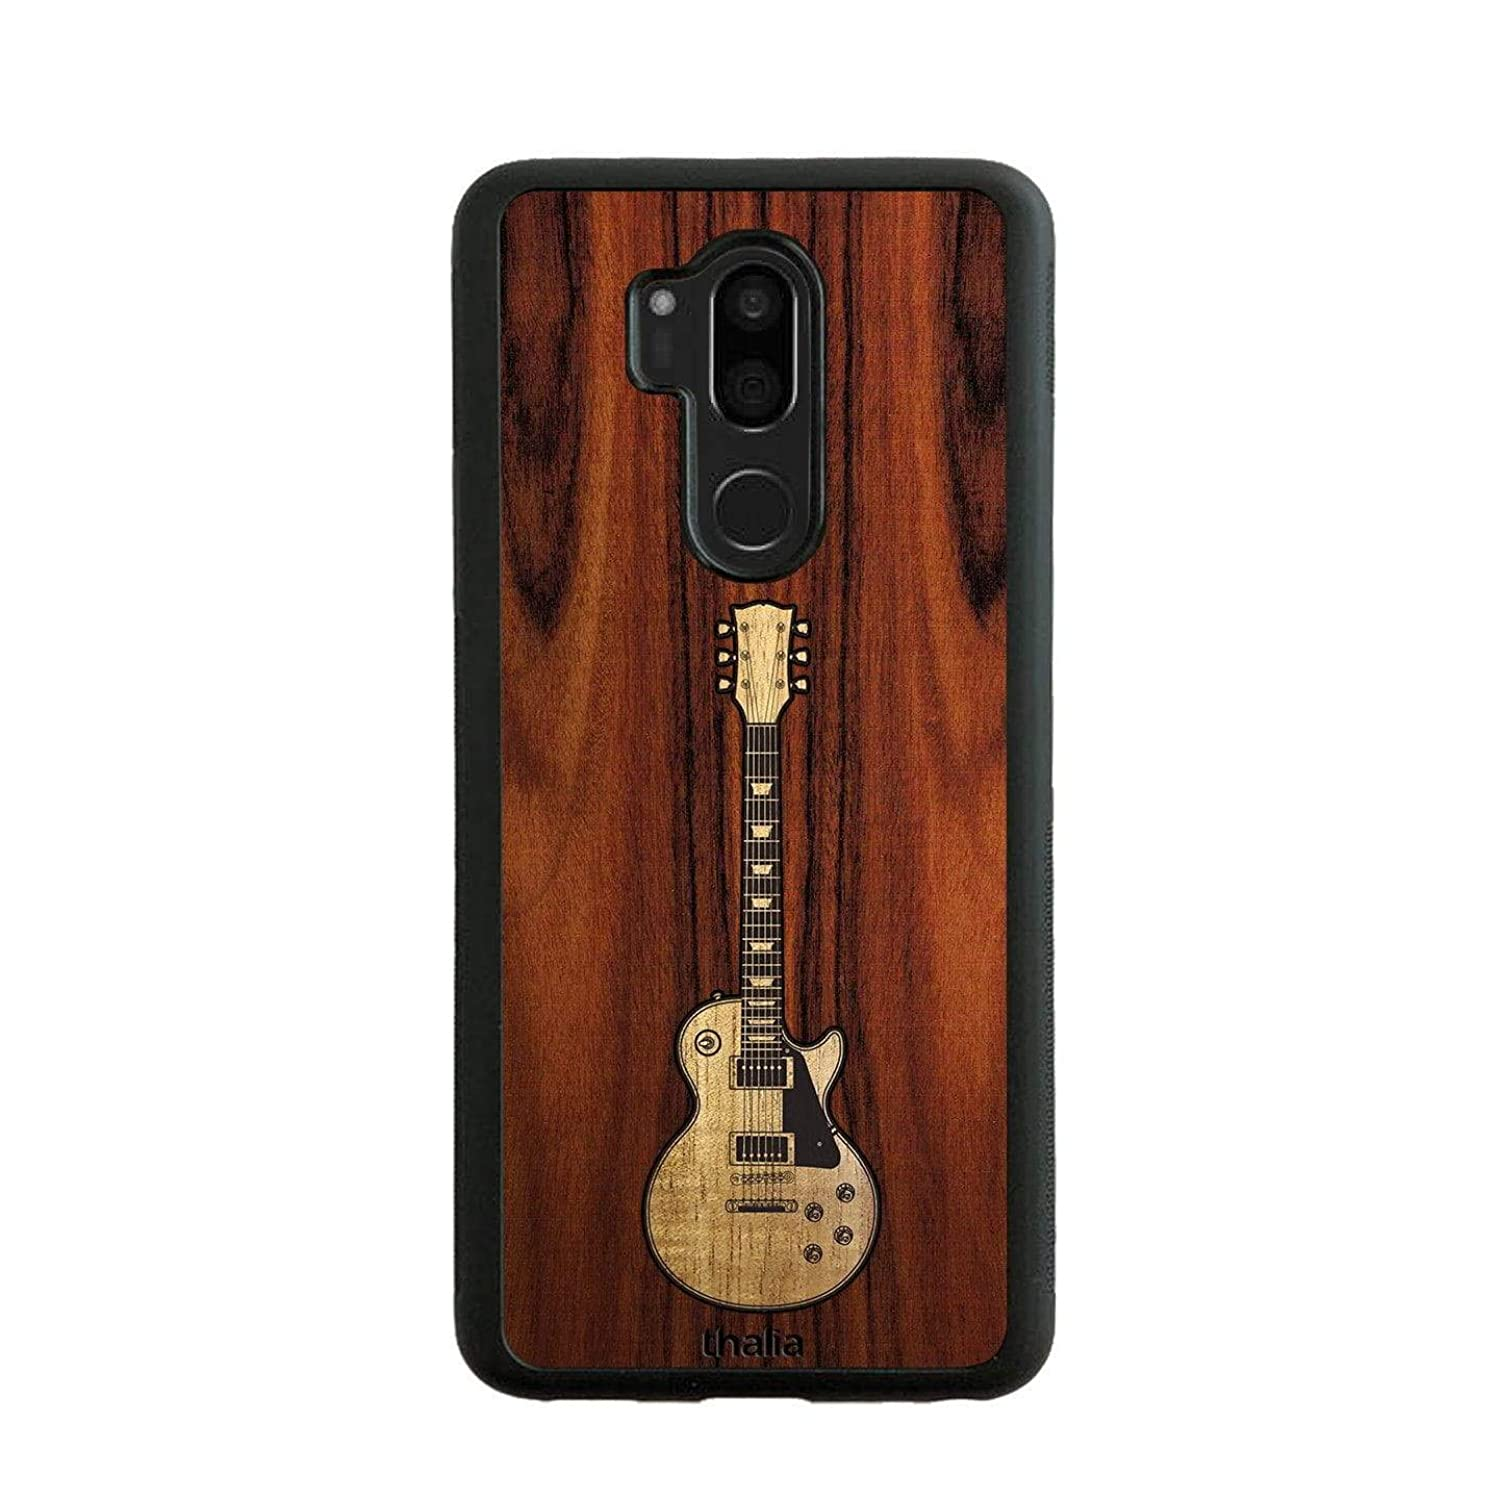 Santos Rosewood & Les Paul Hawaiian Koa Inlaid Guitar Phone Case   Thalia Exotic Wood Cases LG G7